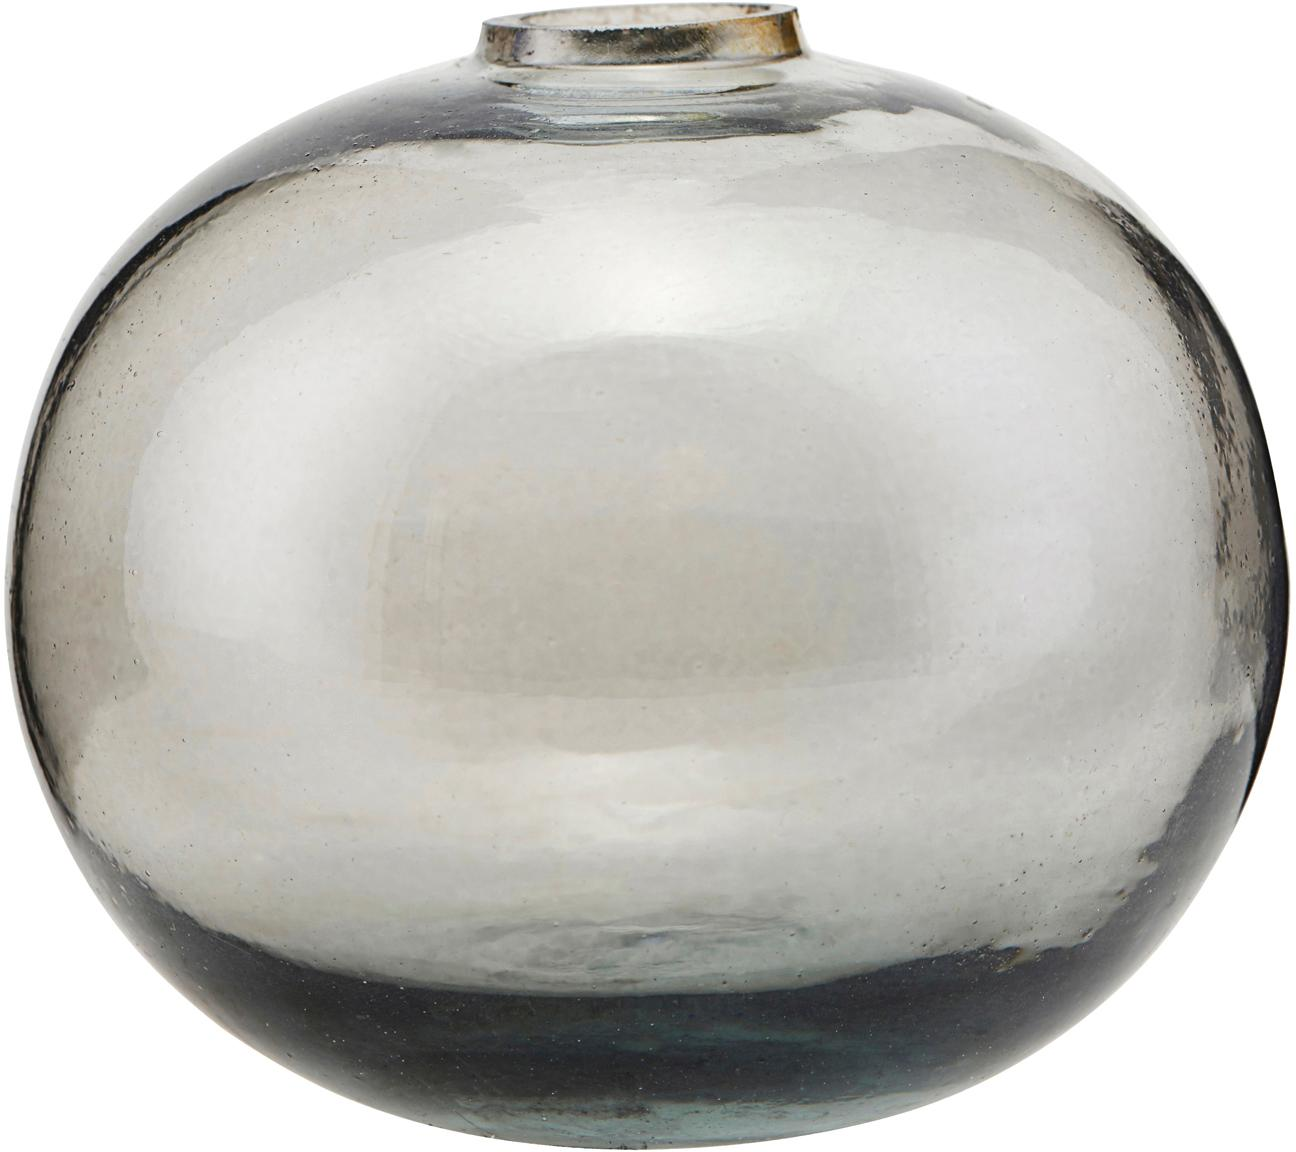 Glas-Vase Sandra, Glas, Grau, transparent, Ø 8 x H 7 cm